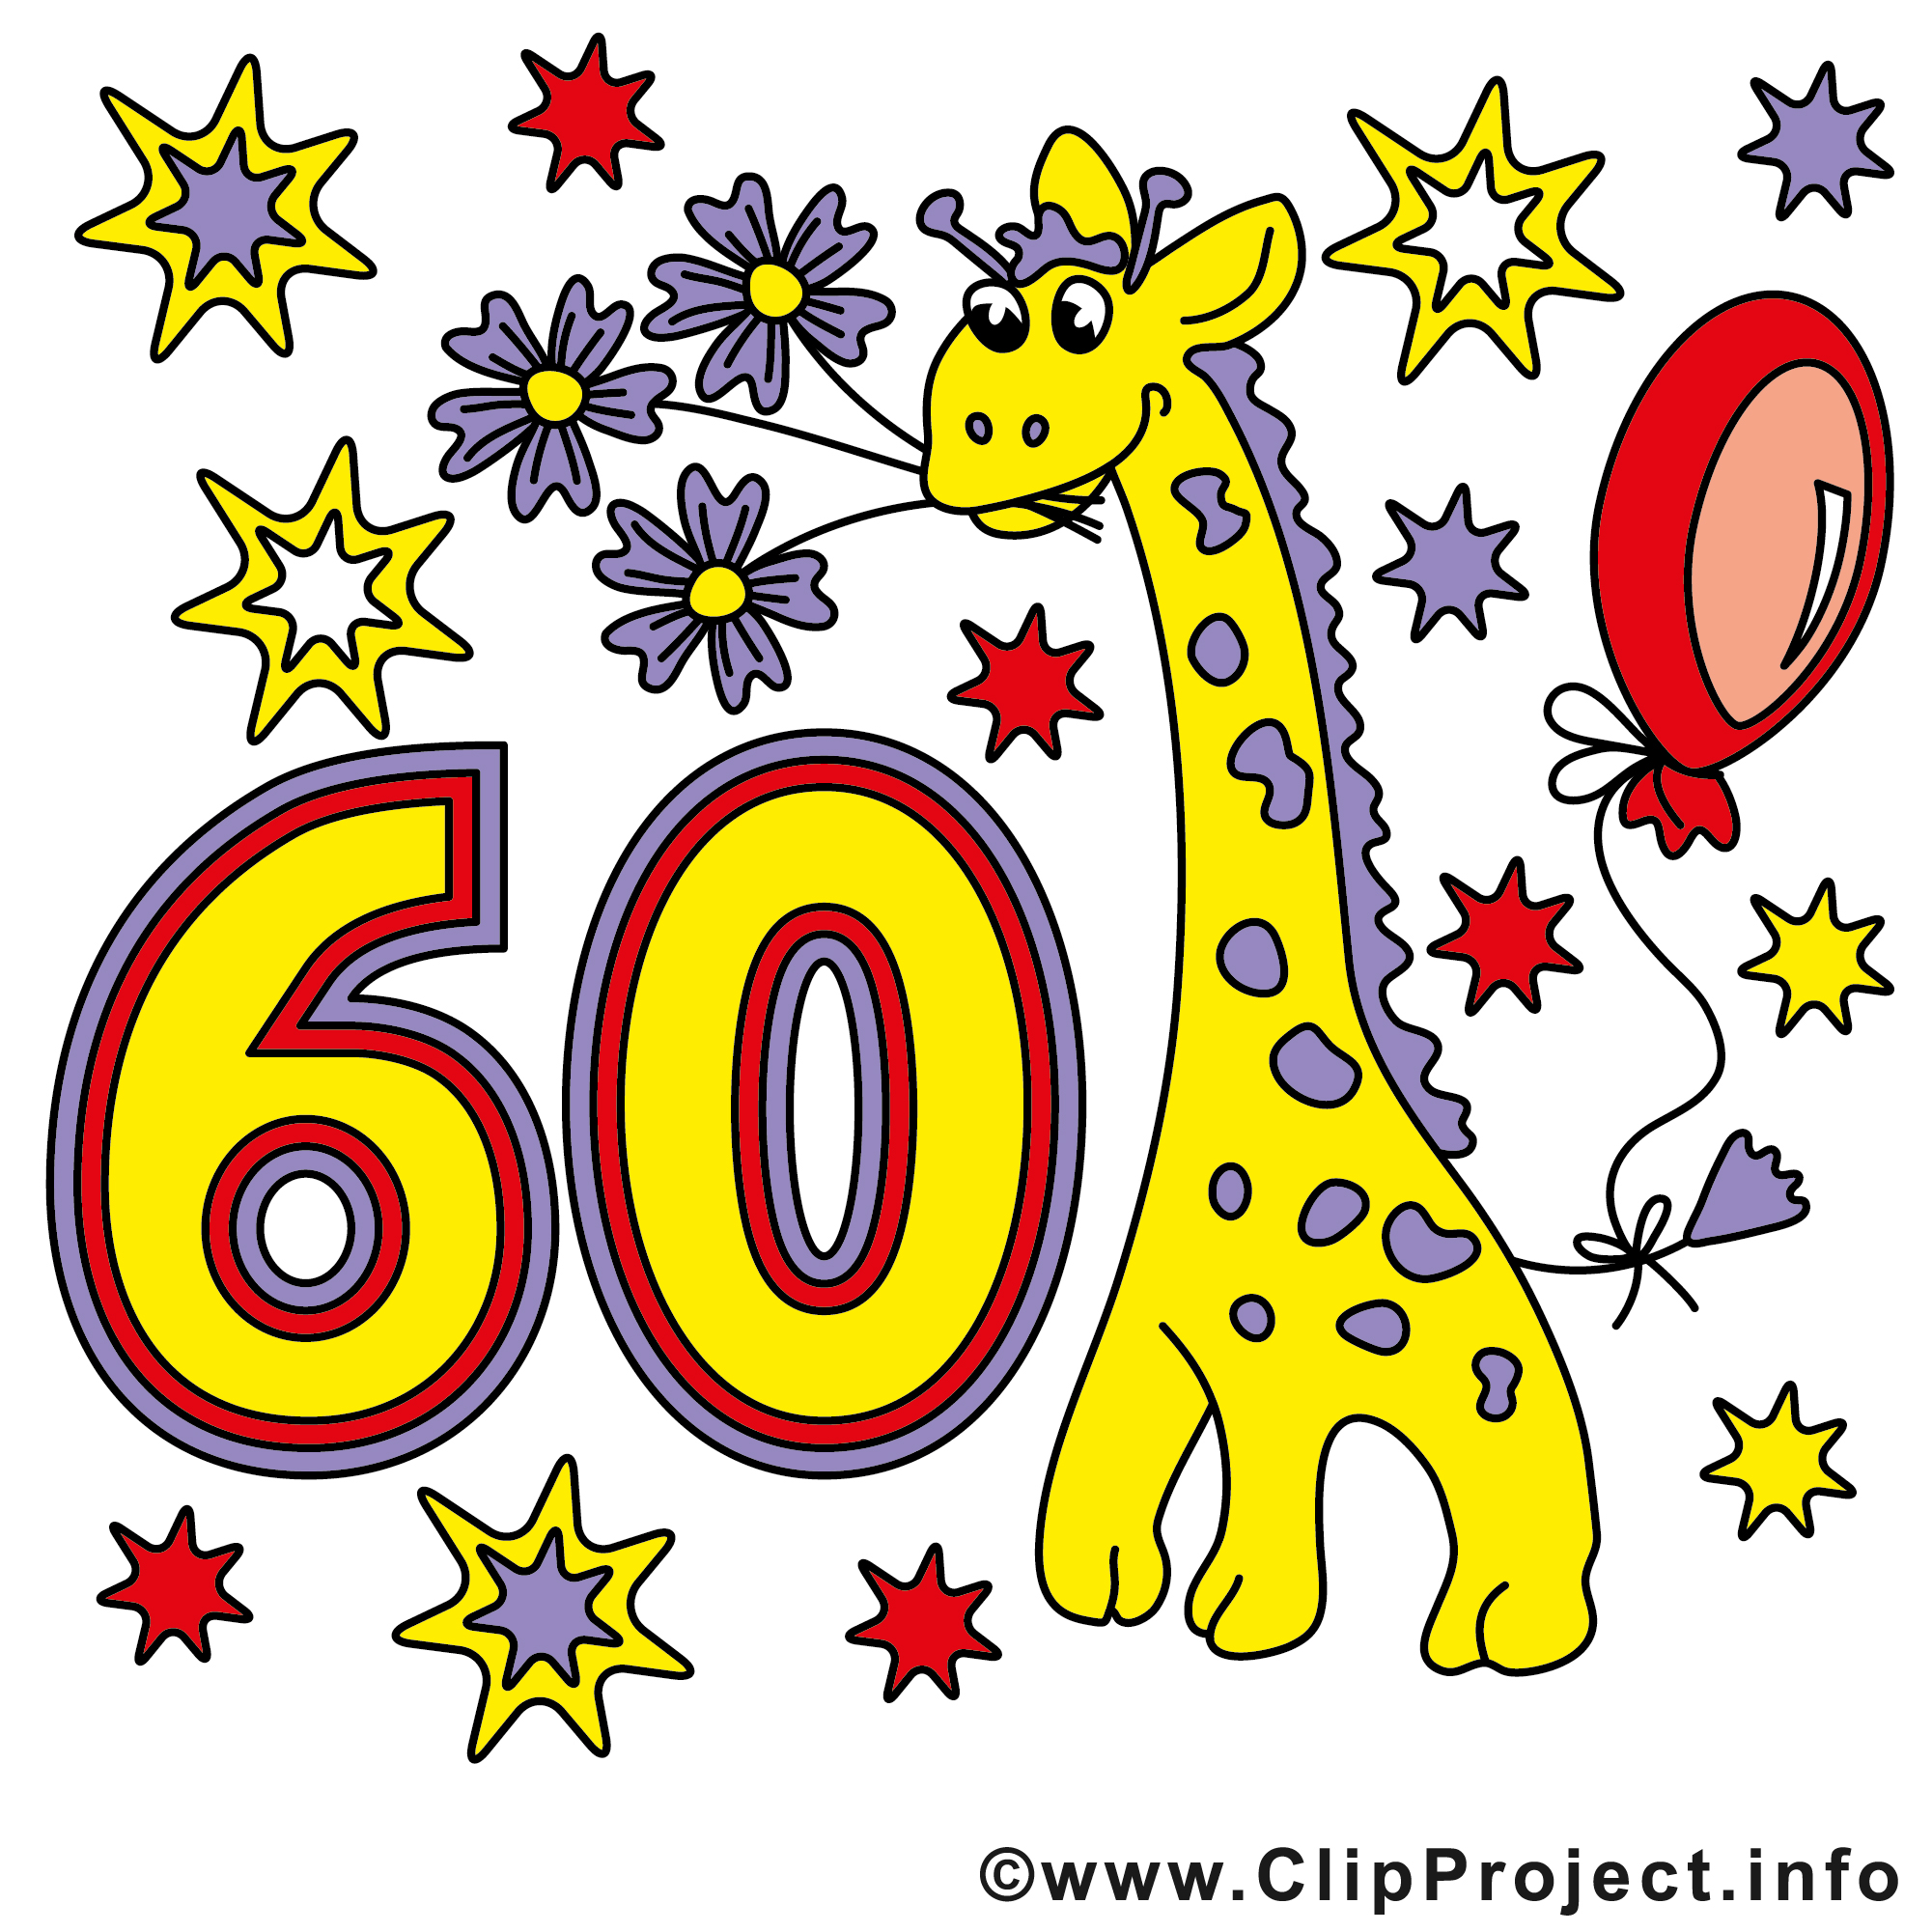 Girafe 60 ans images anniversaire clip art gratuit anniversaire dessin picture image - Clipart anniversaire 60 ans ...